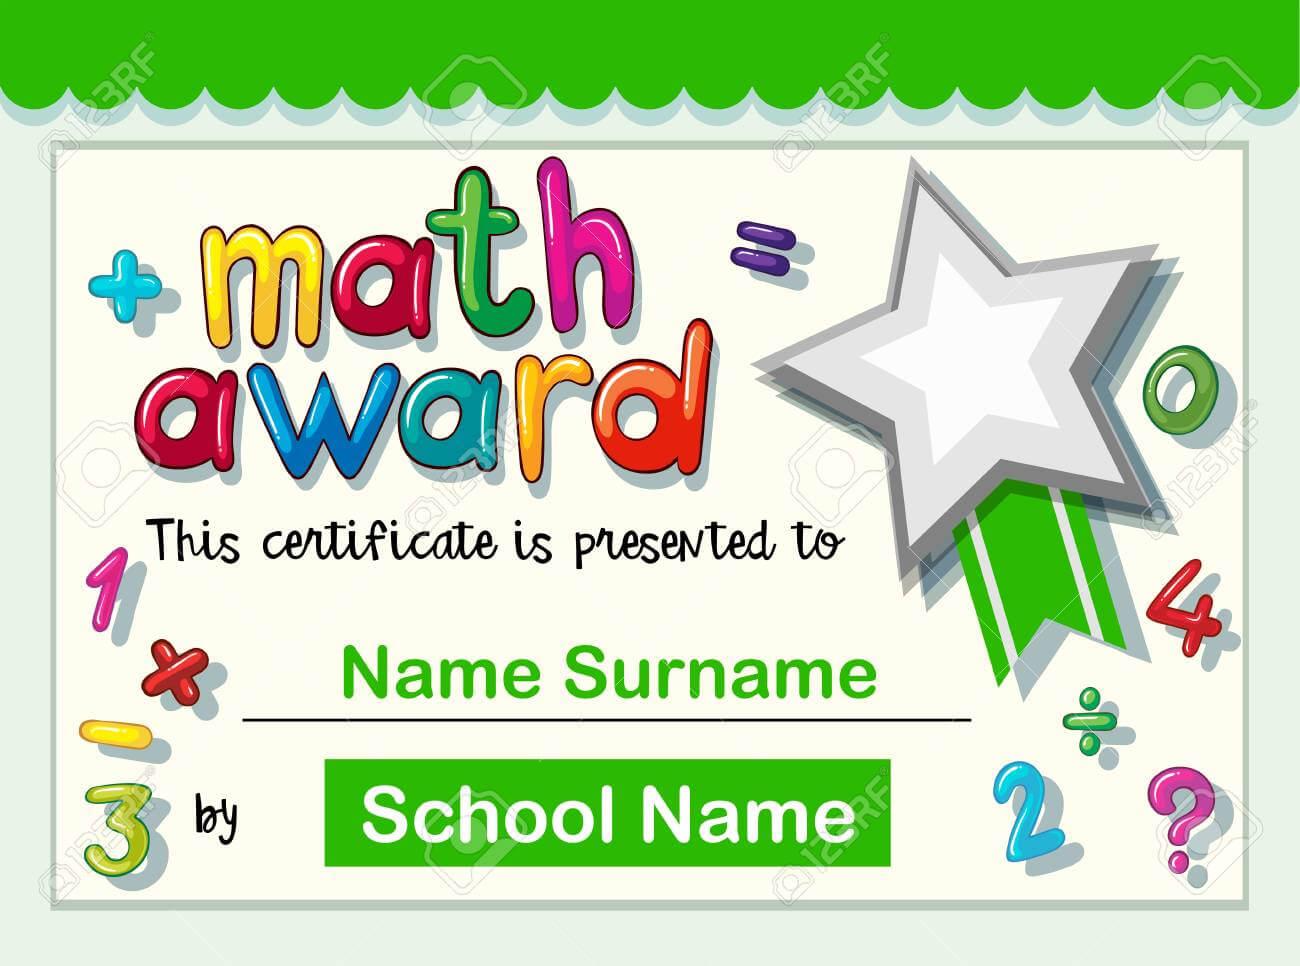 Certificate Template For Math Award Illustration pertaining to Math Certificate Template